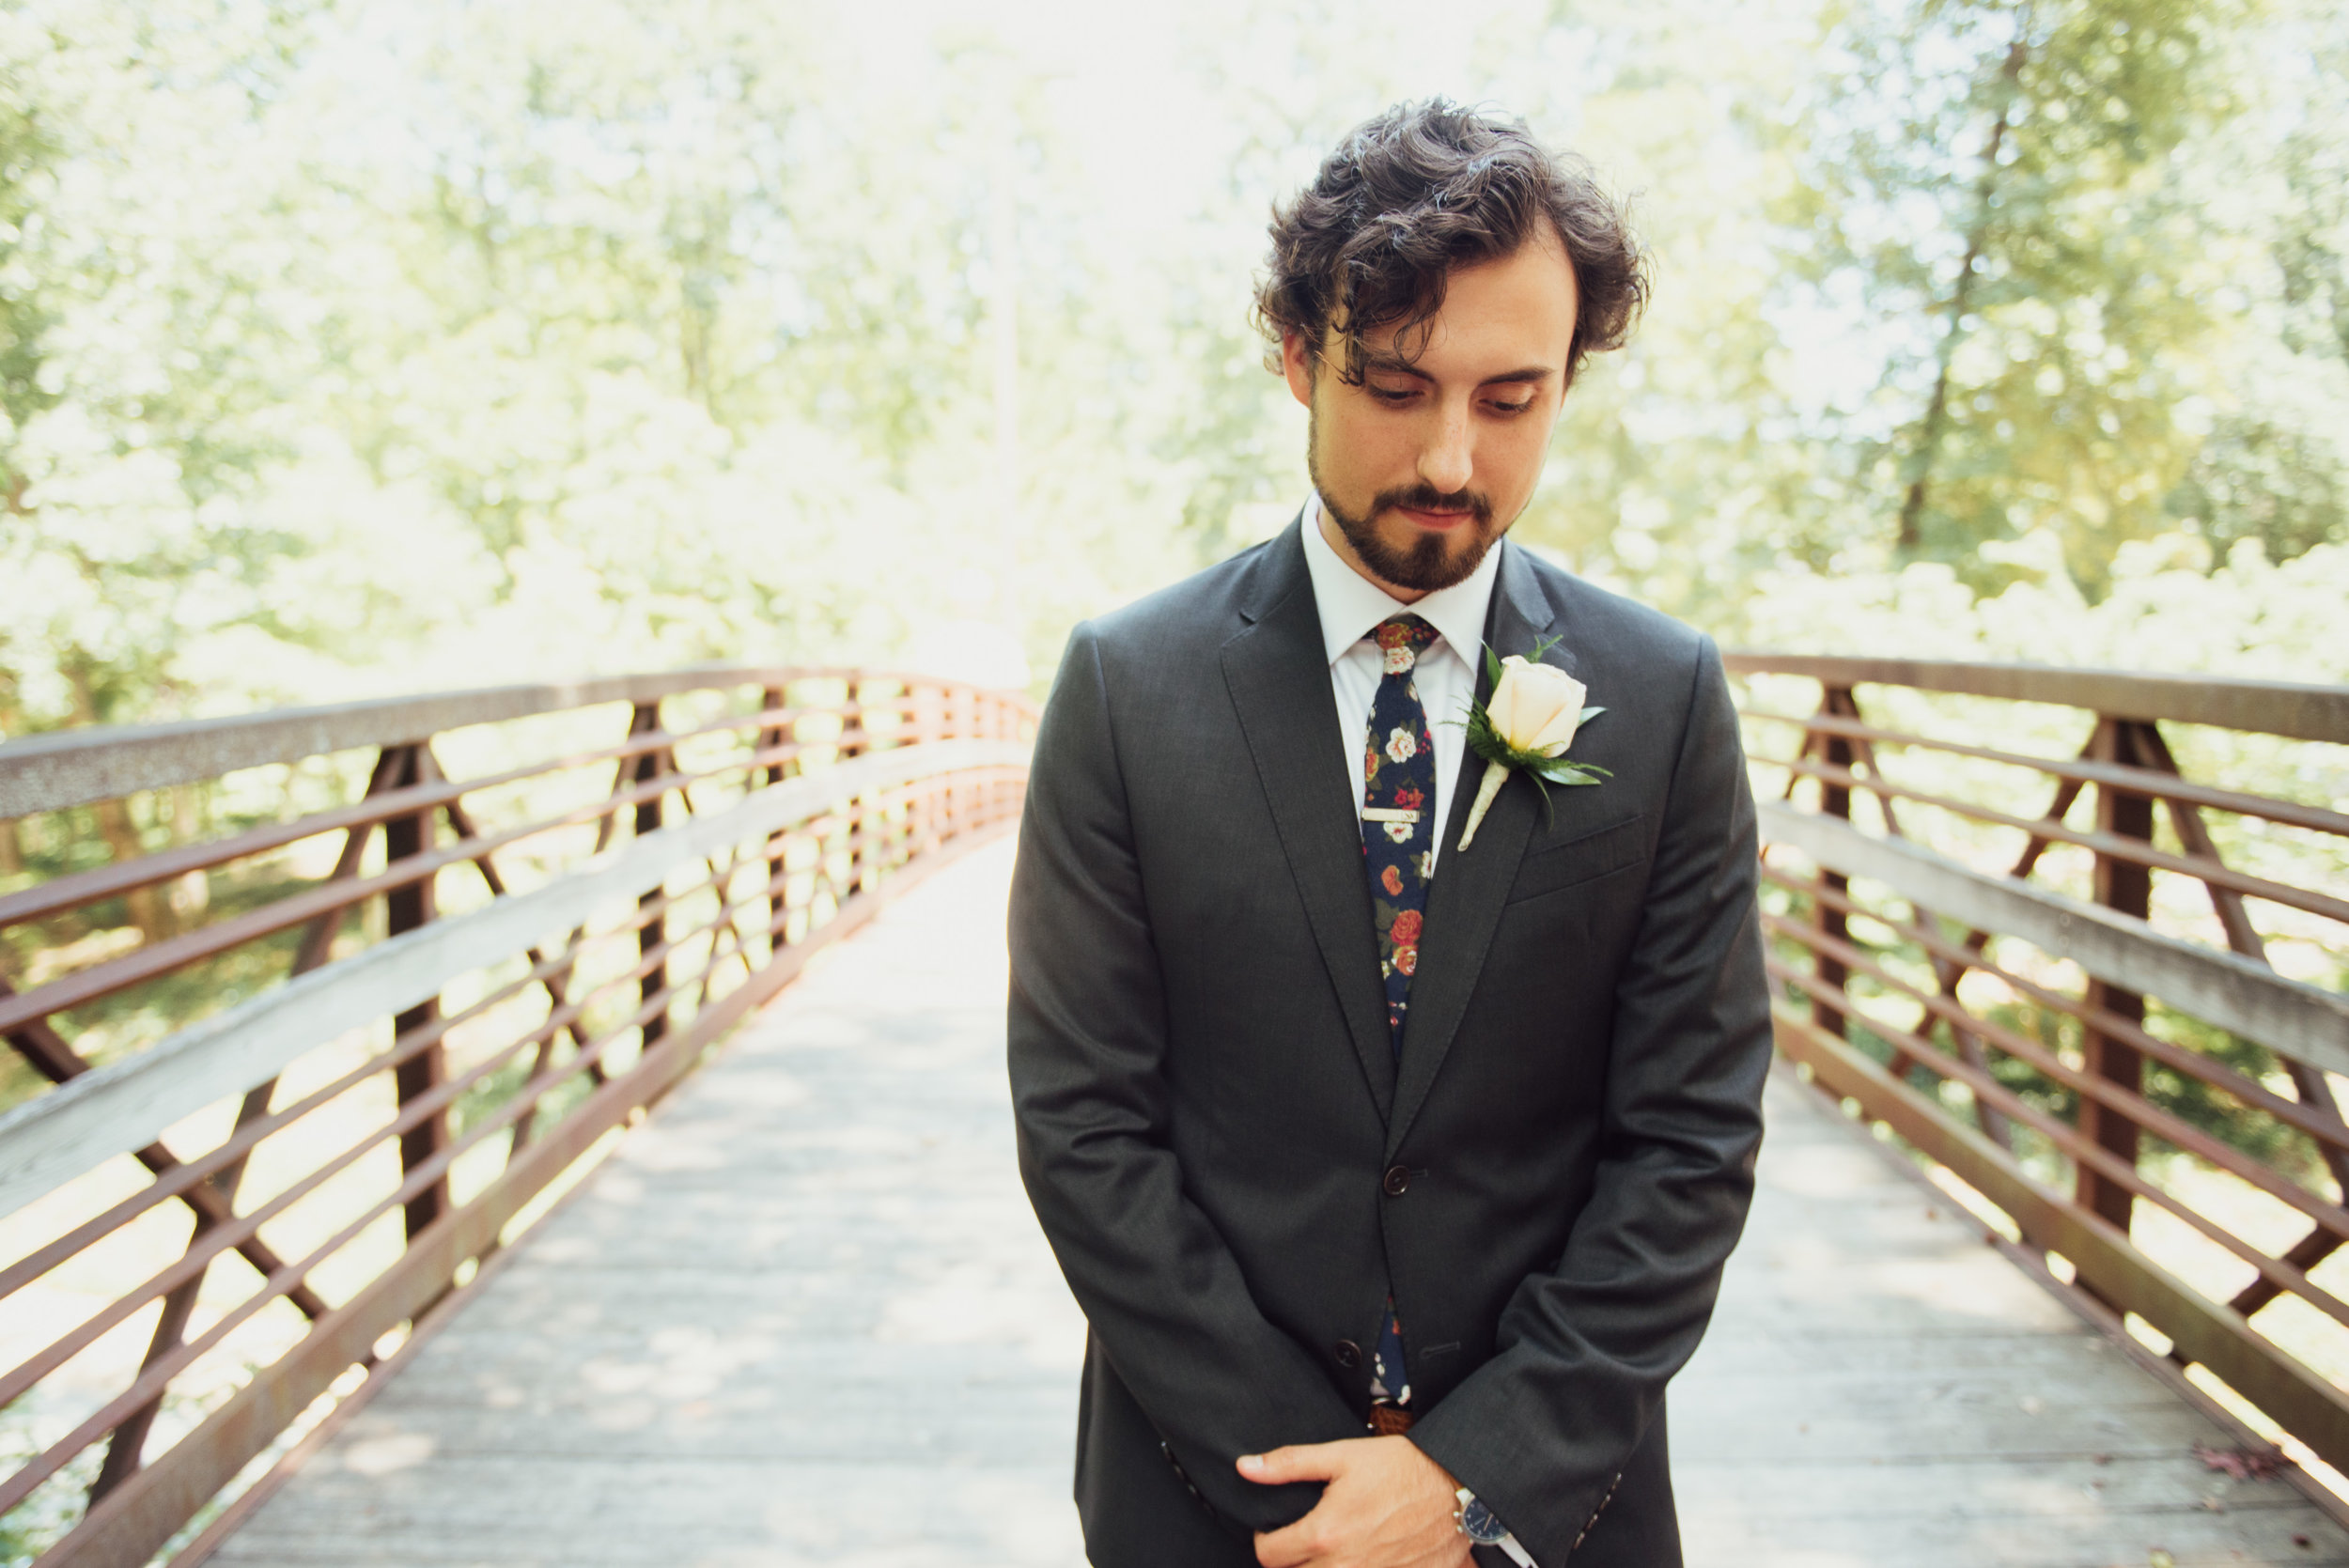 cleland-studios-wedding-photography-24.jpg